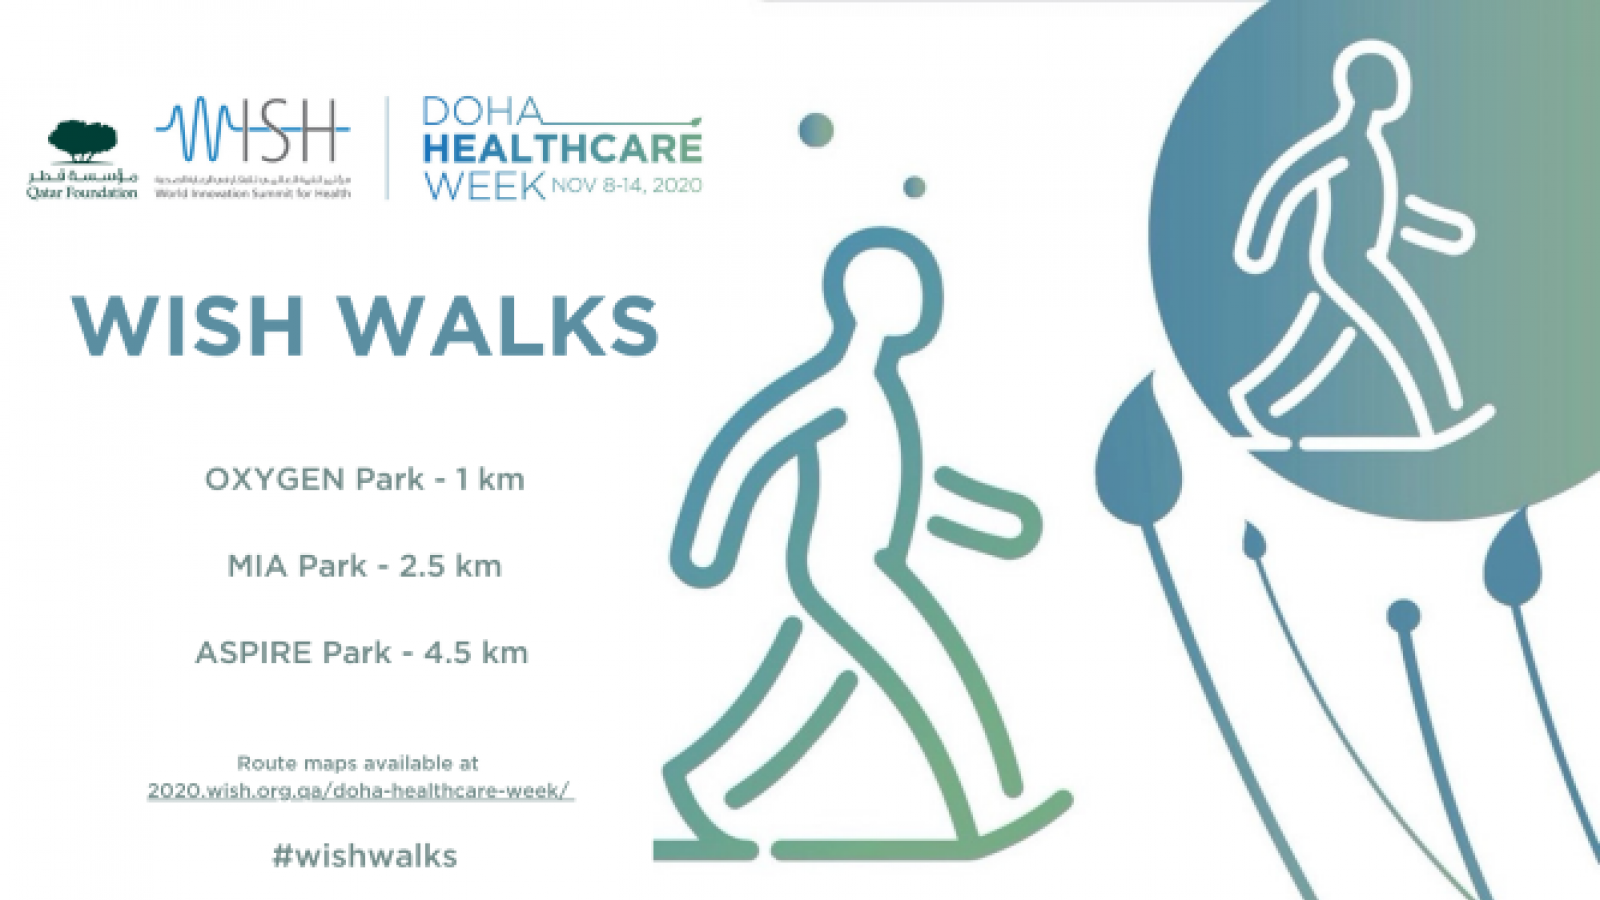 WISH to host 'WISH Walks' in the beautiful public parks of Qatar